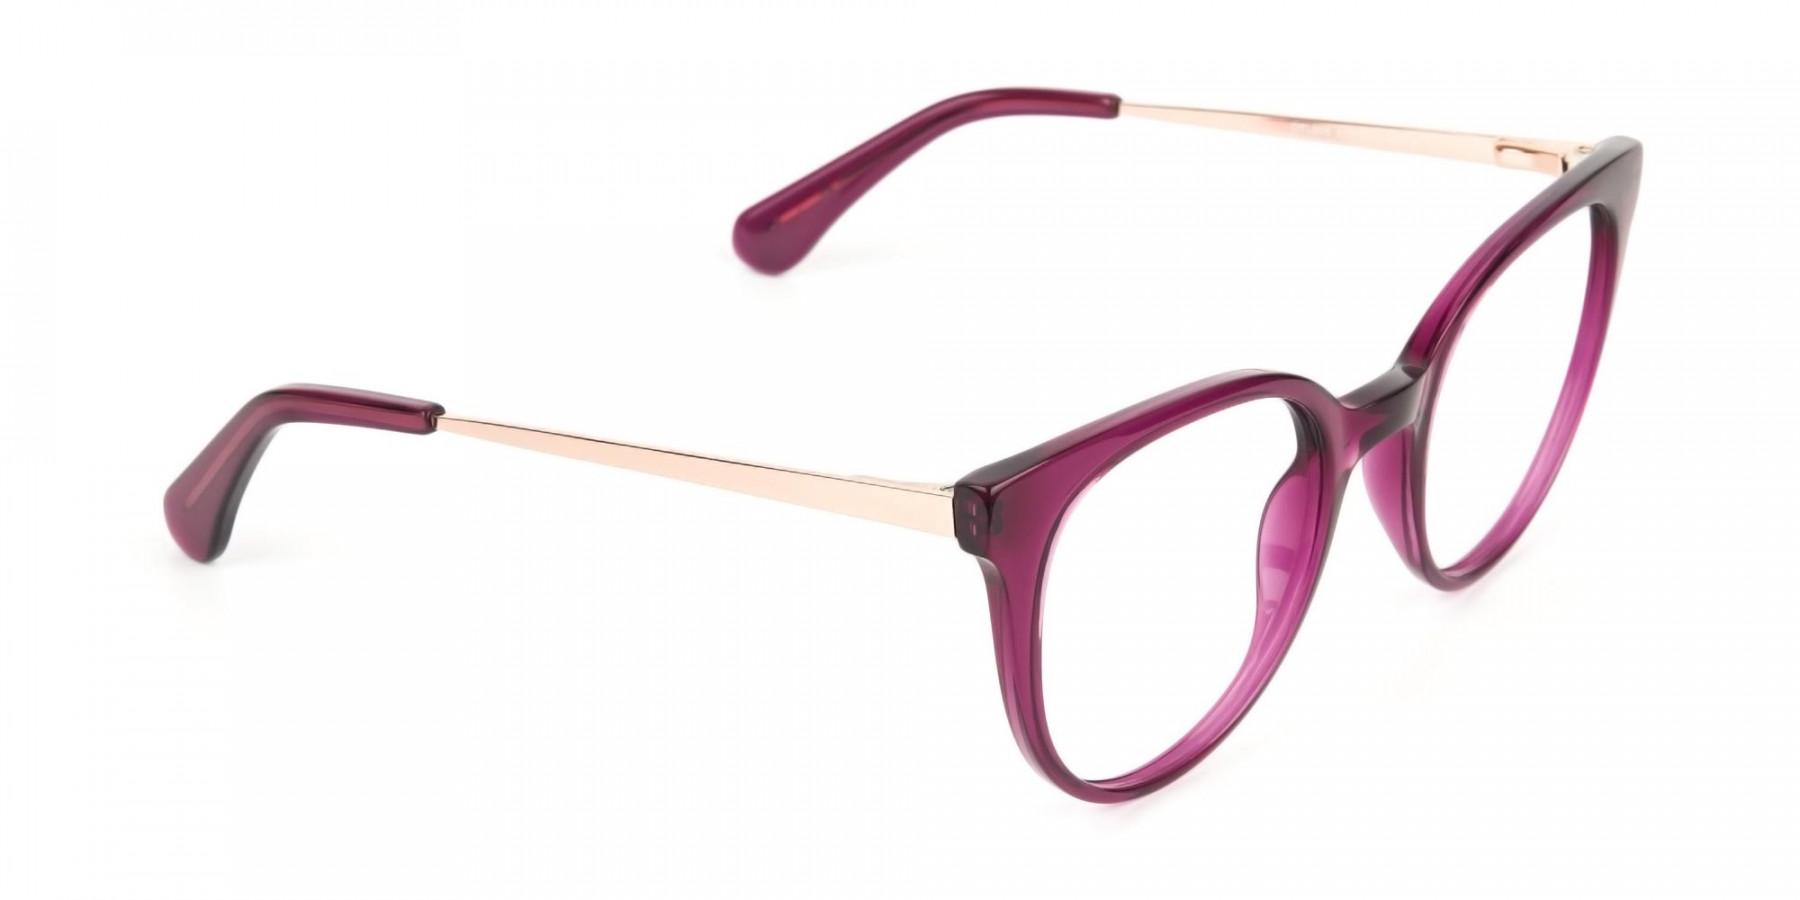 Magenta (Red/Purple) Round Cat-Eye Glasses-1